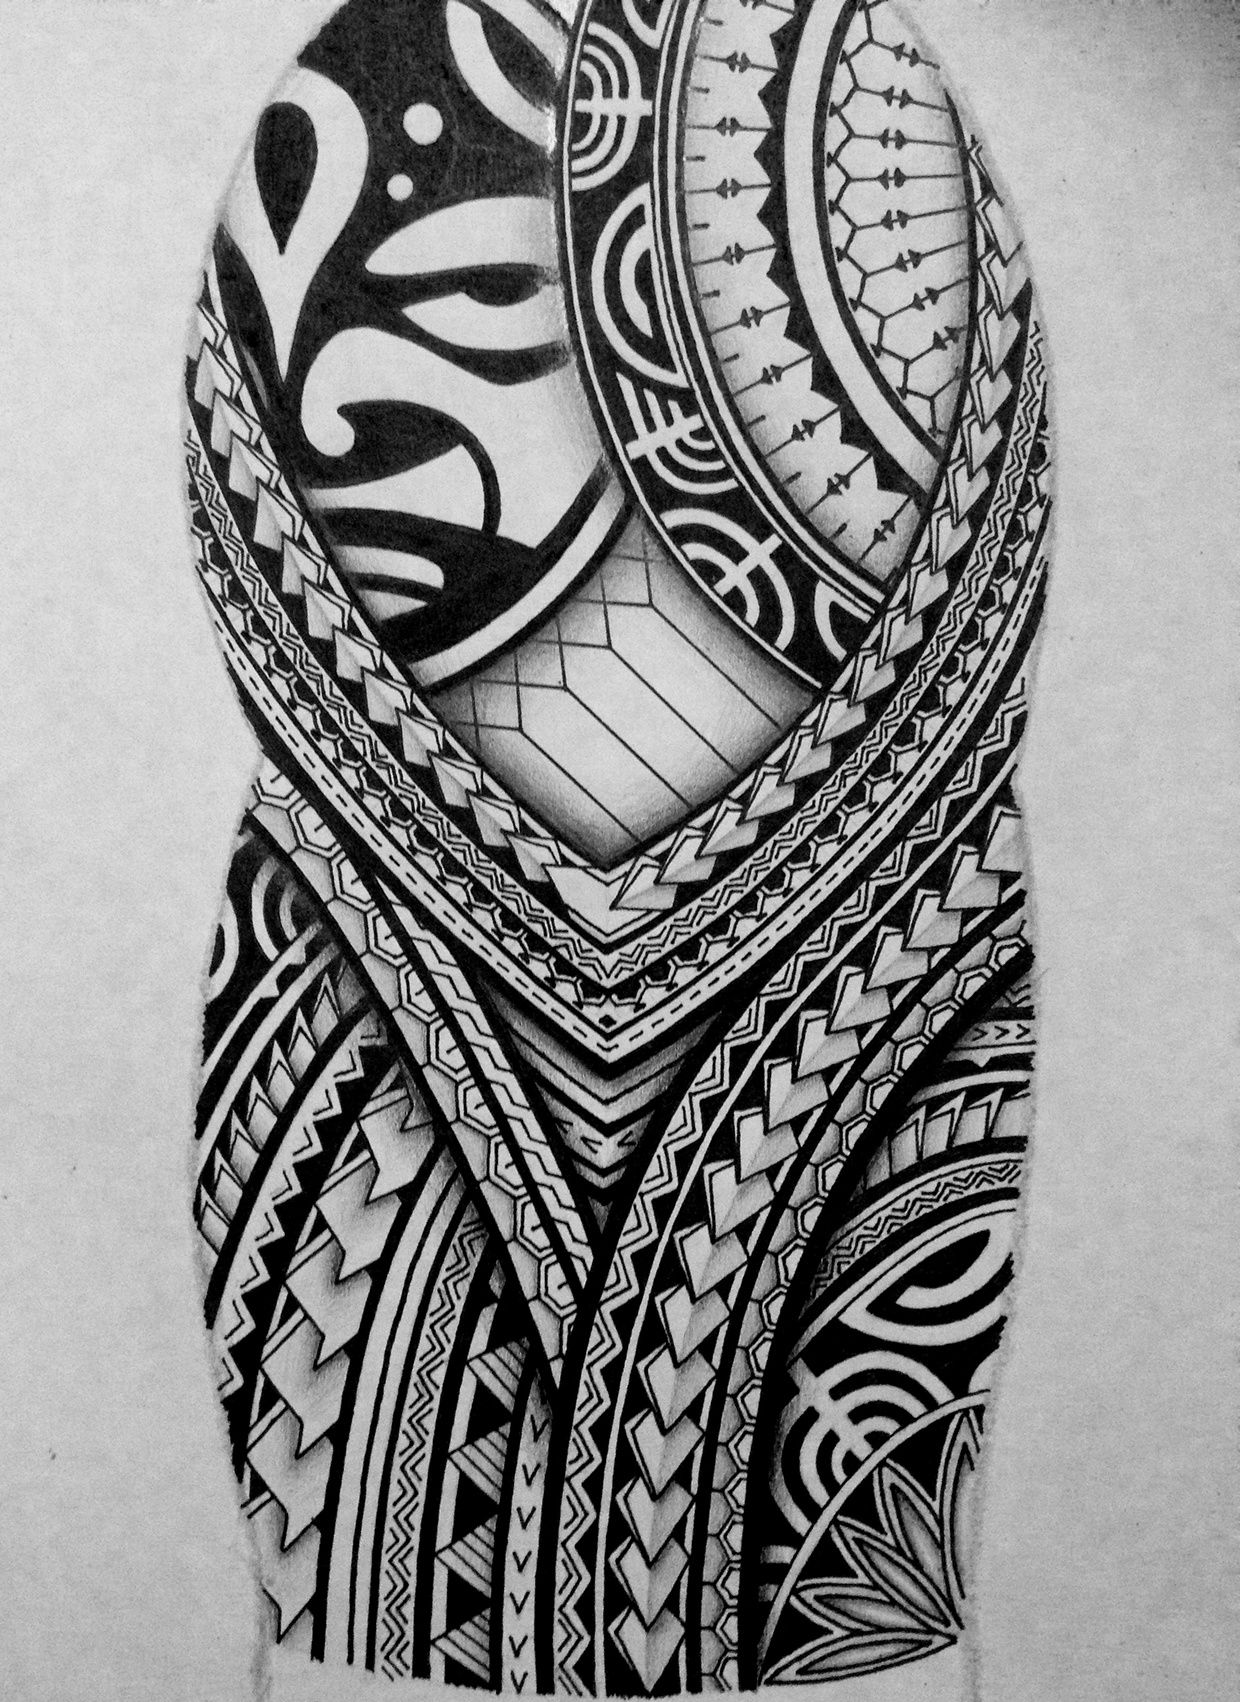 Sketch Style Tattoo Sleeve: I Created A Polynesian Half Sleeve Tattoo Design For My